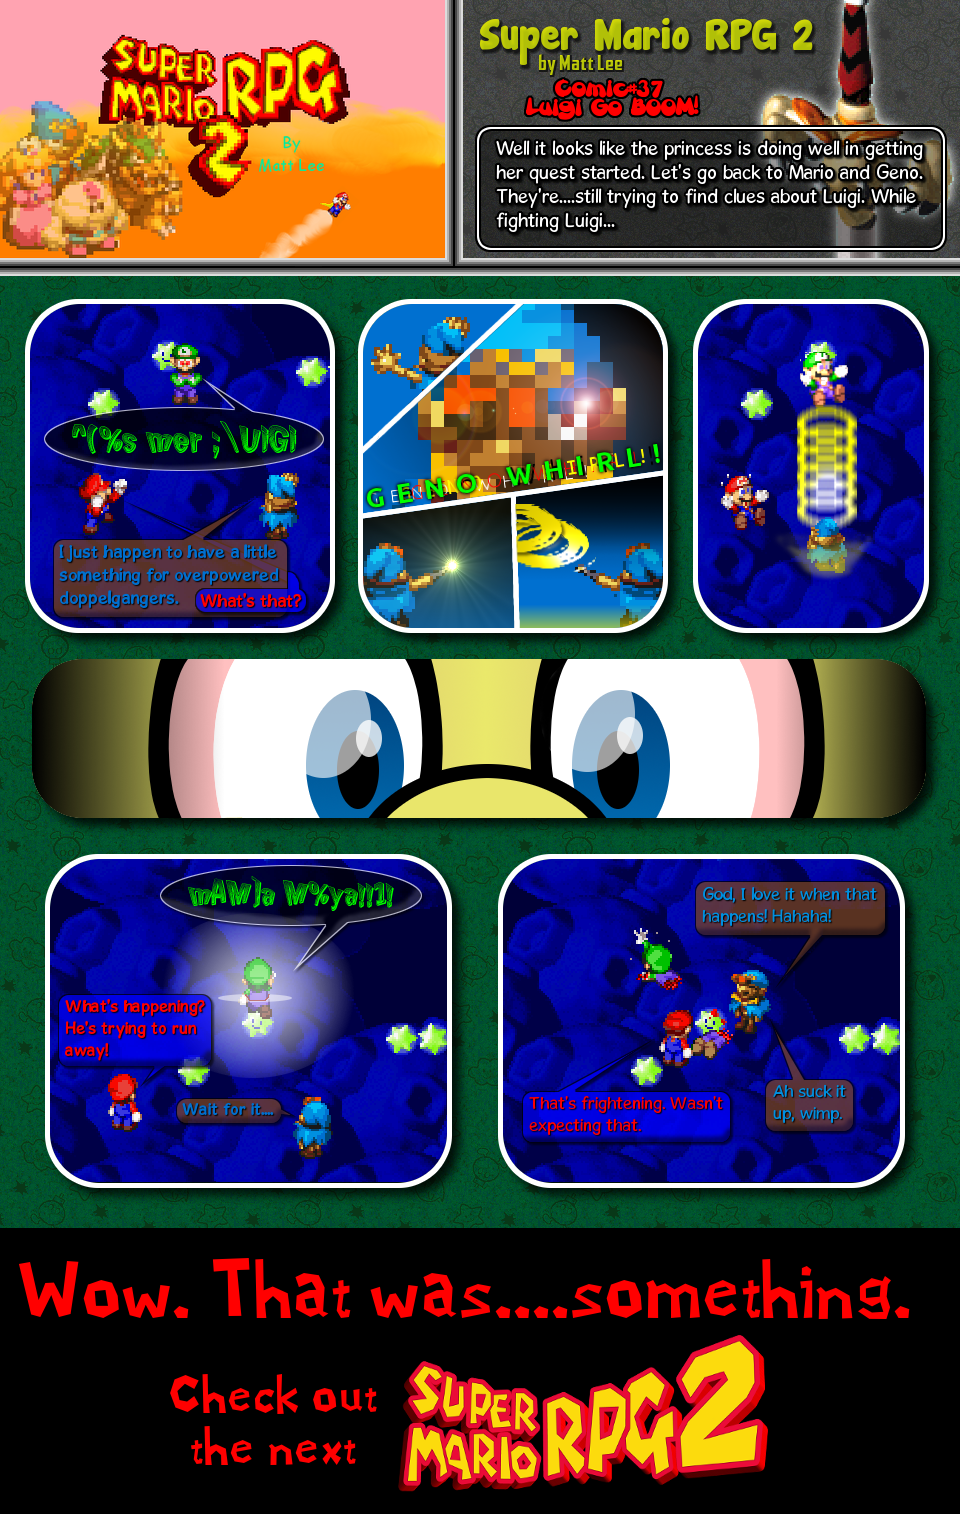 Super Mario RPG 2 - Webcomic by Matt Lee